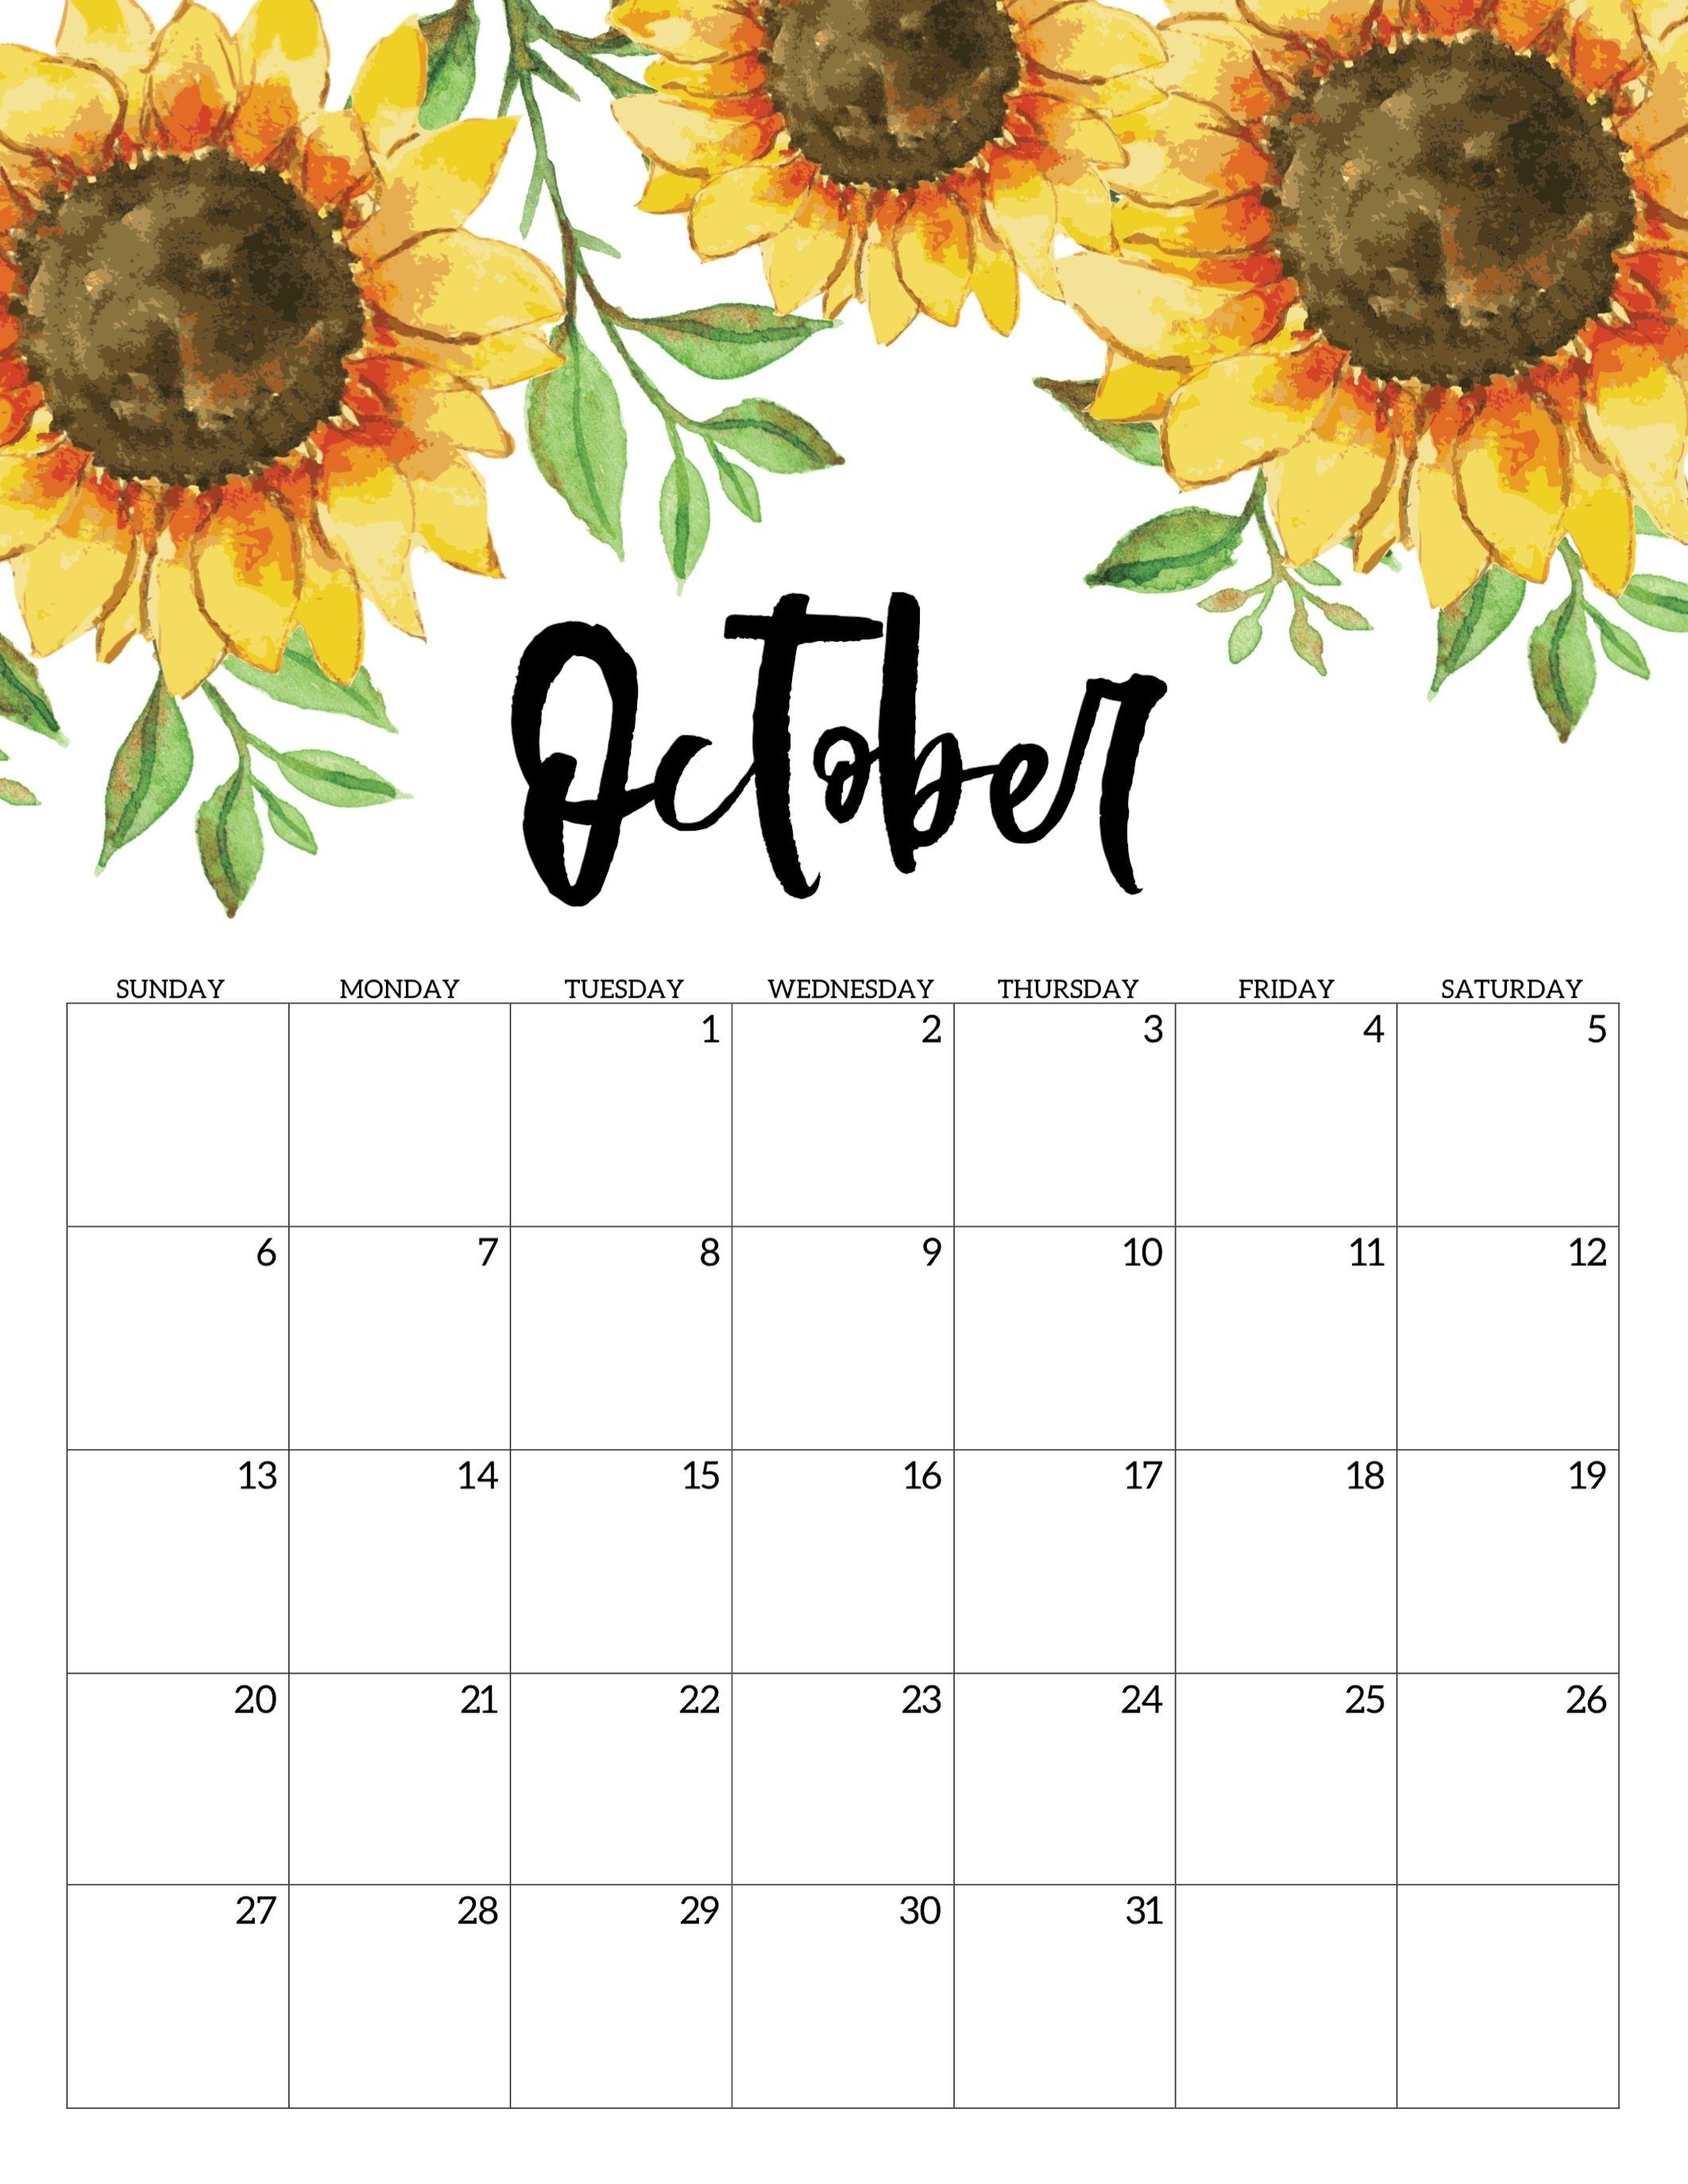 Pinhelen J On Kalendar | Calendar, Calendar 2019 Printable, Free throughout Free Printable Advent Calendars Wallpaper